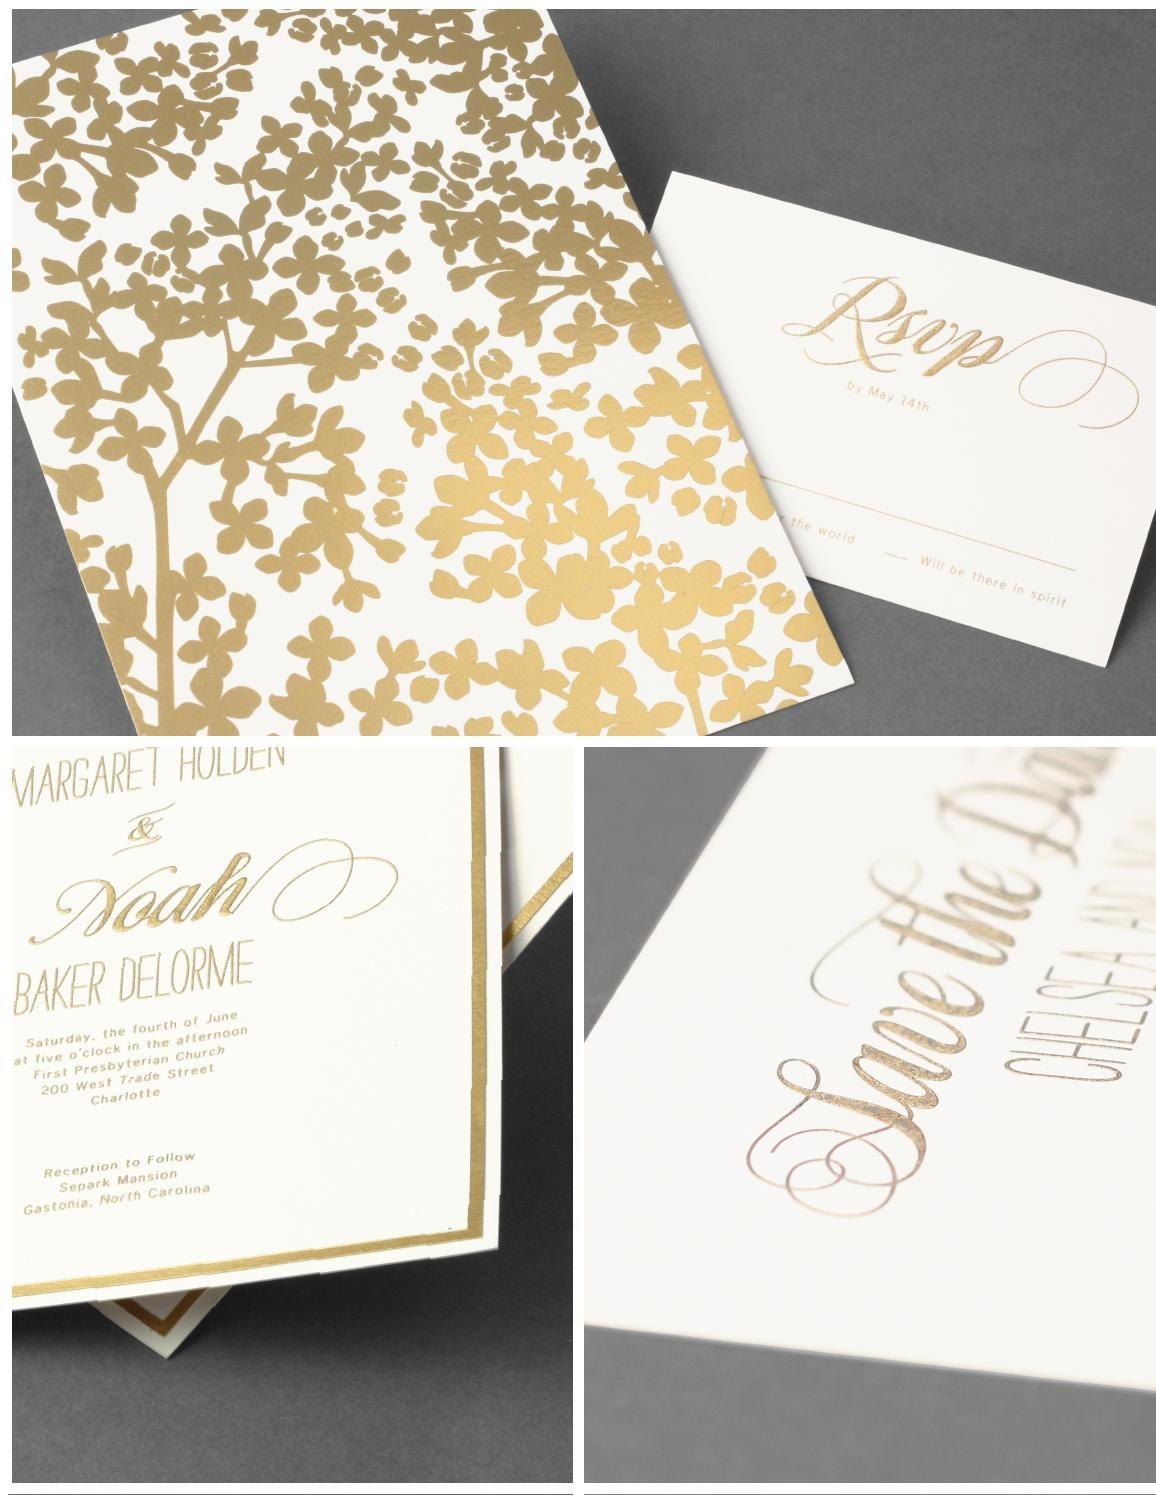 Vera Wang On Weddings Volume Ii Wedding Paper Invitation Ideas